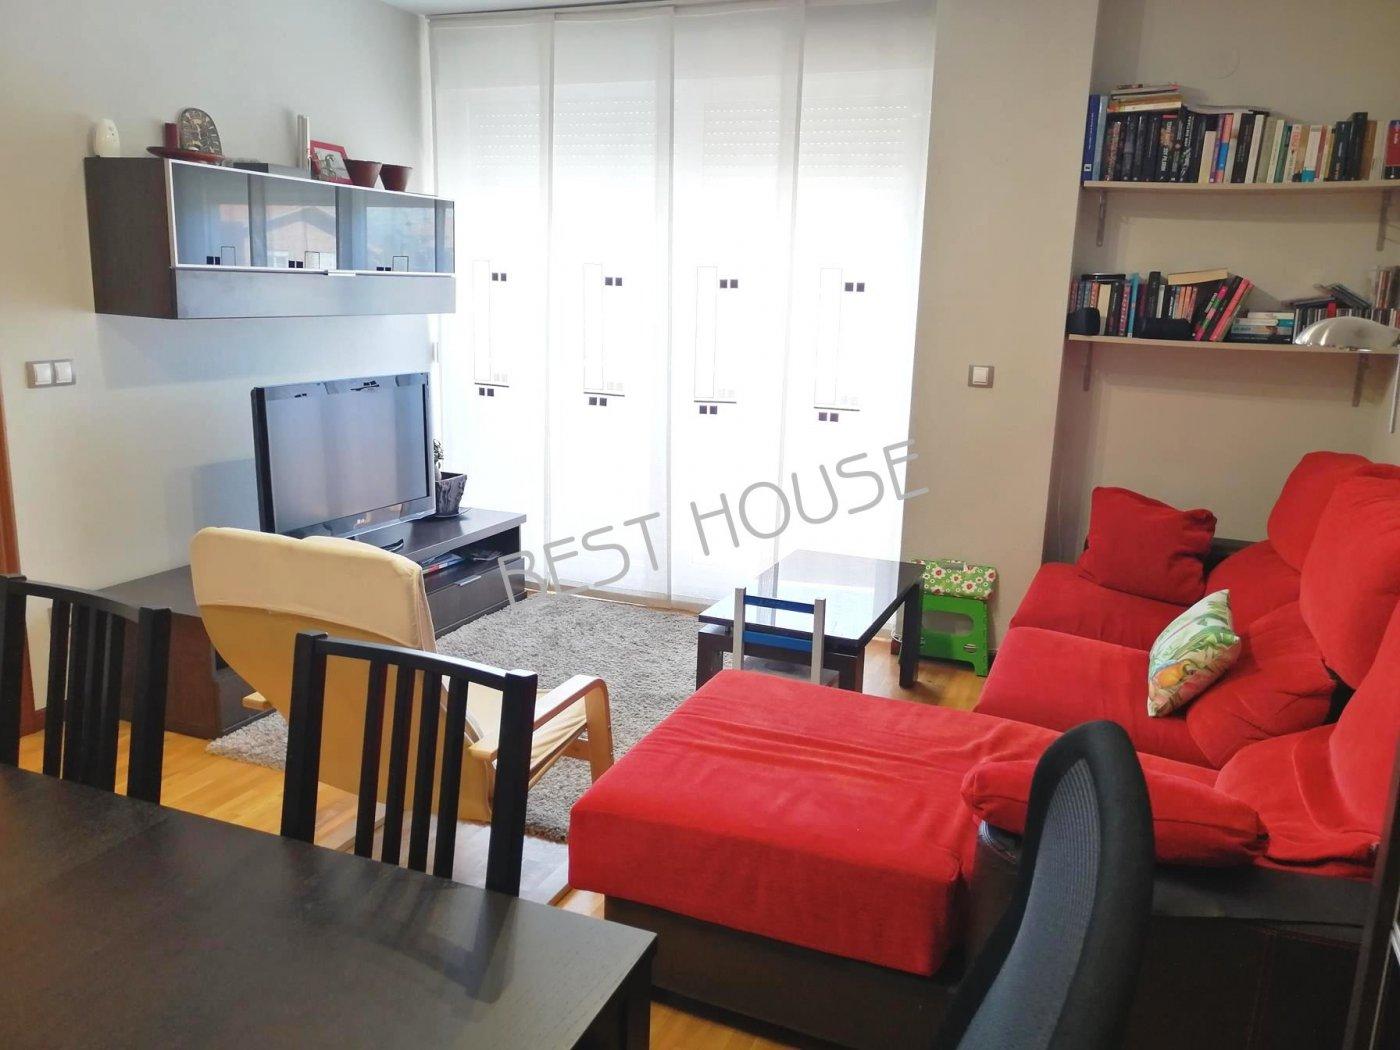 Apartamento, LAKUA-IBAIONDO, Venta - Álava (Álava)